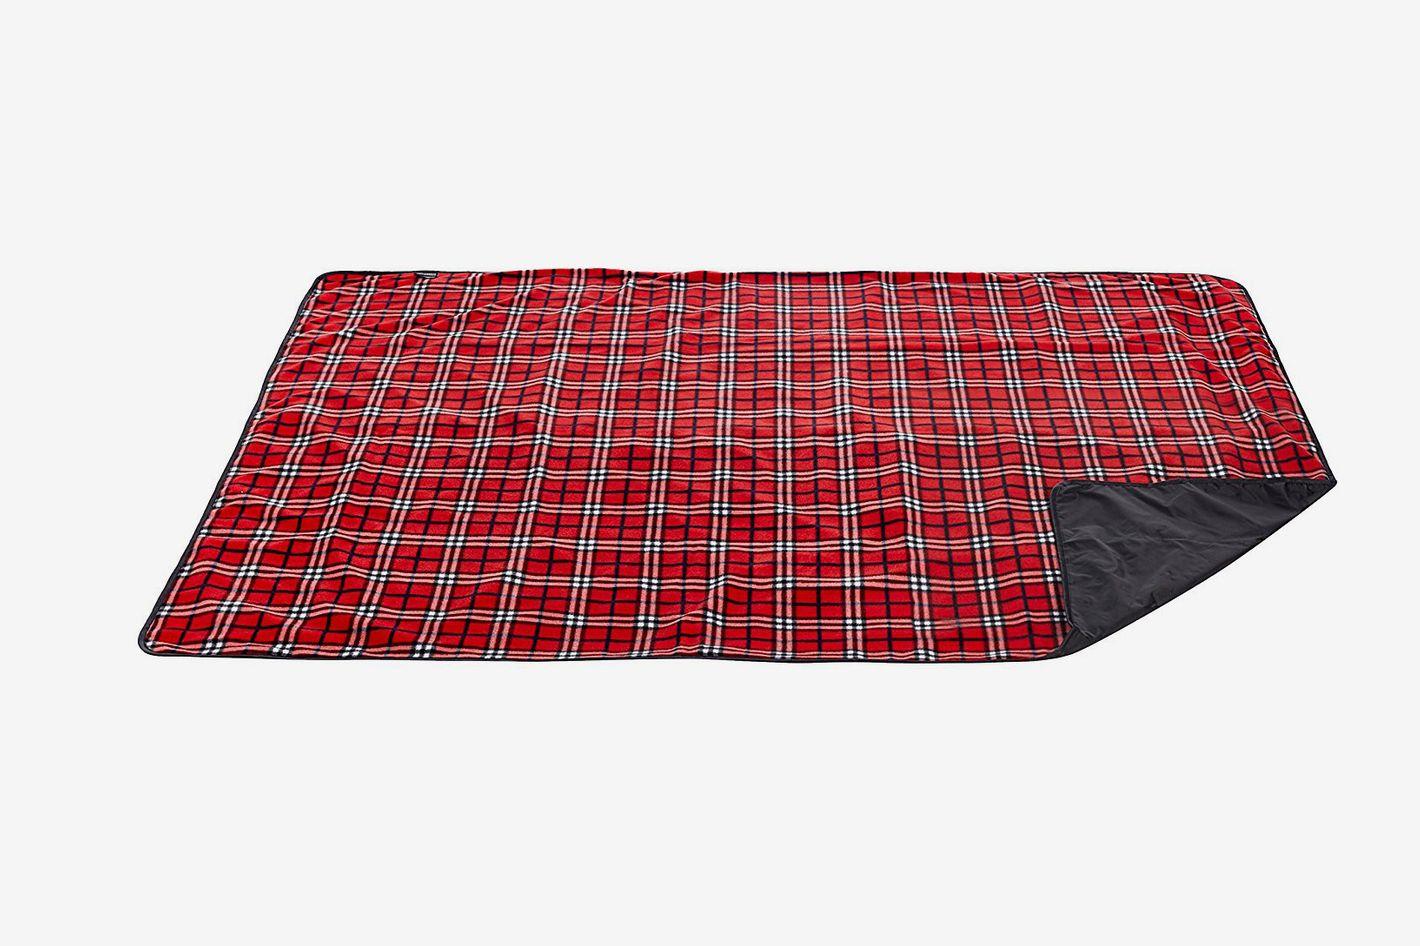 Pratico Outdoors Premium Extra Large Picnic Blanket